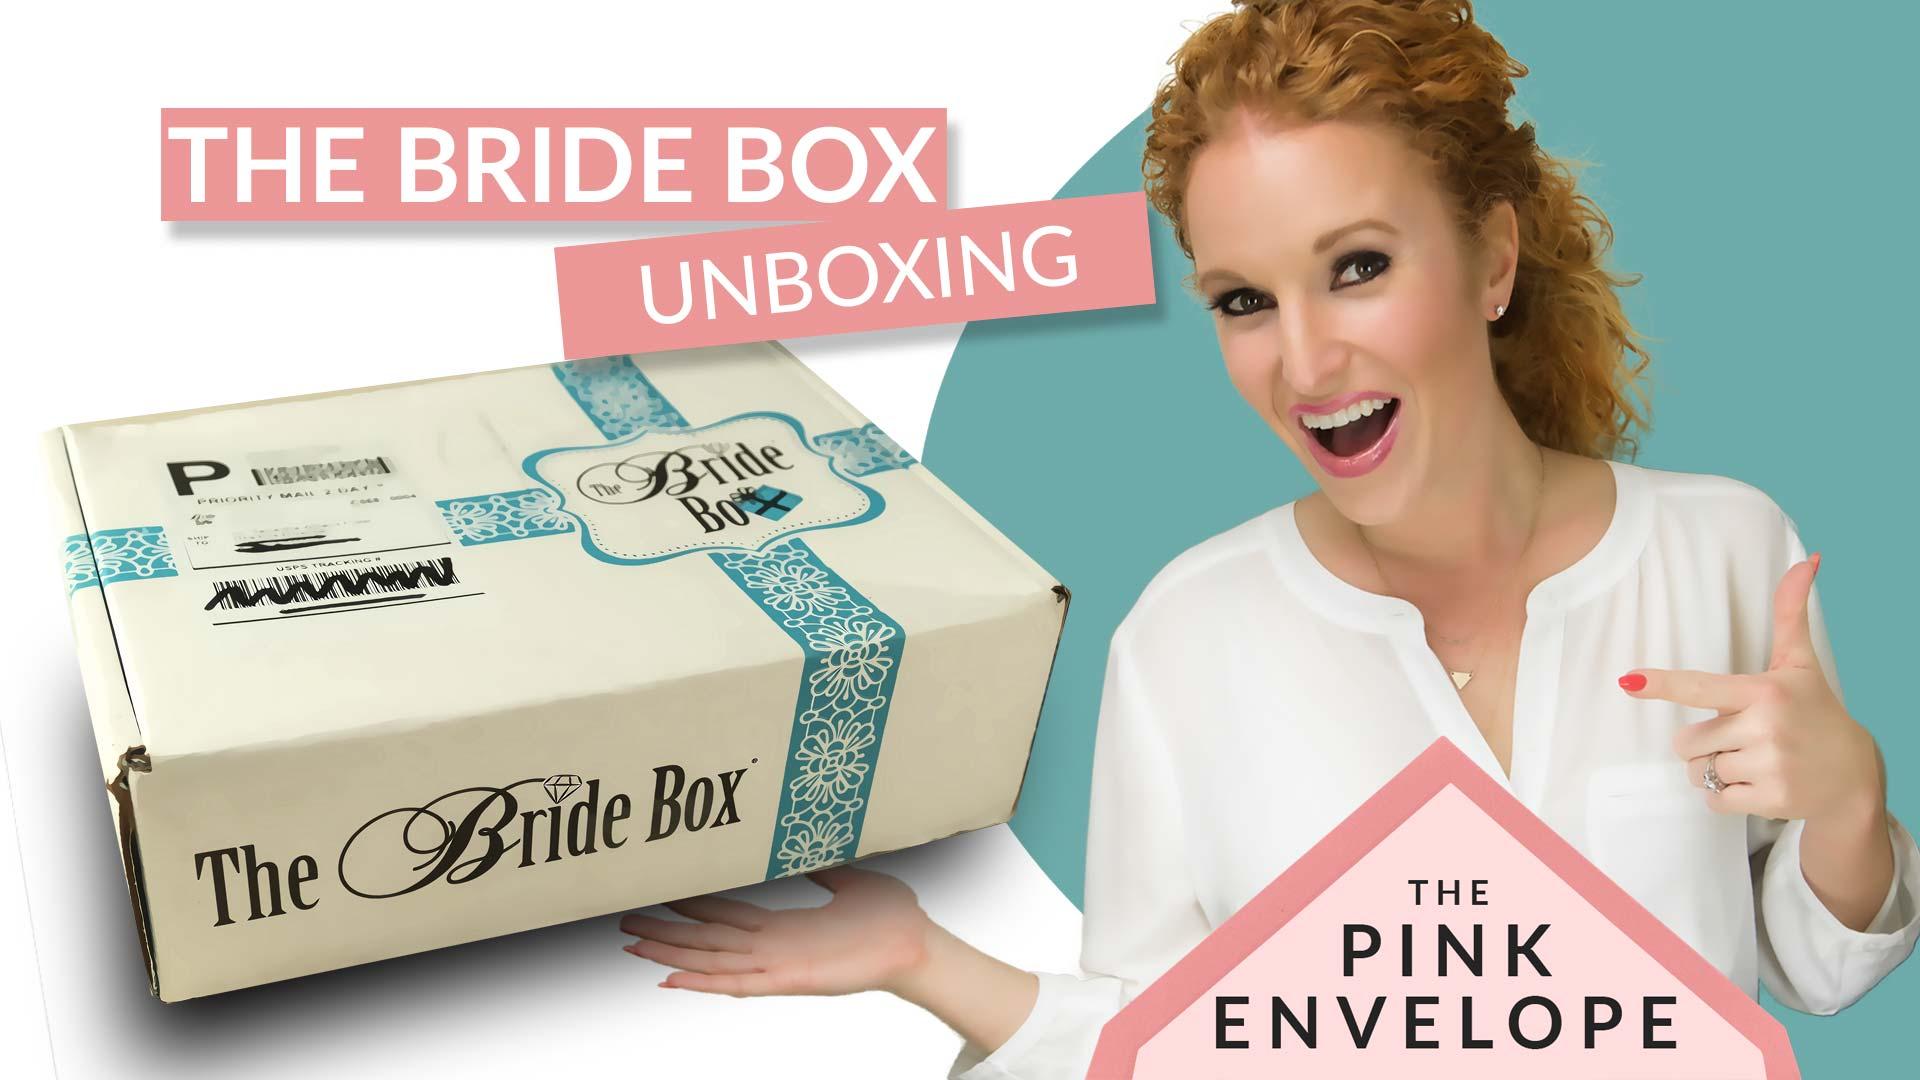 Bridal Subscription Box – The Wedding Box Review